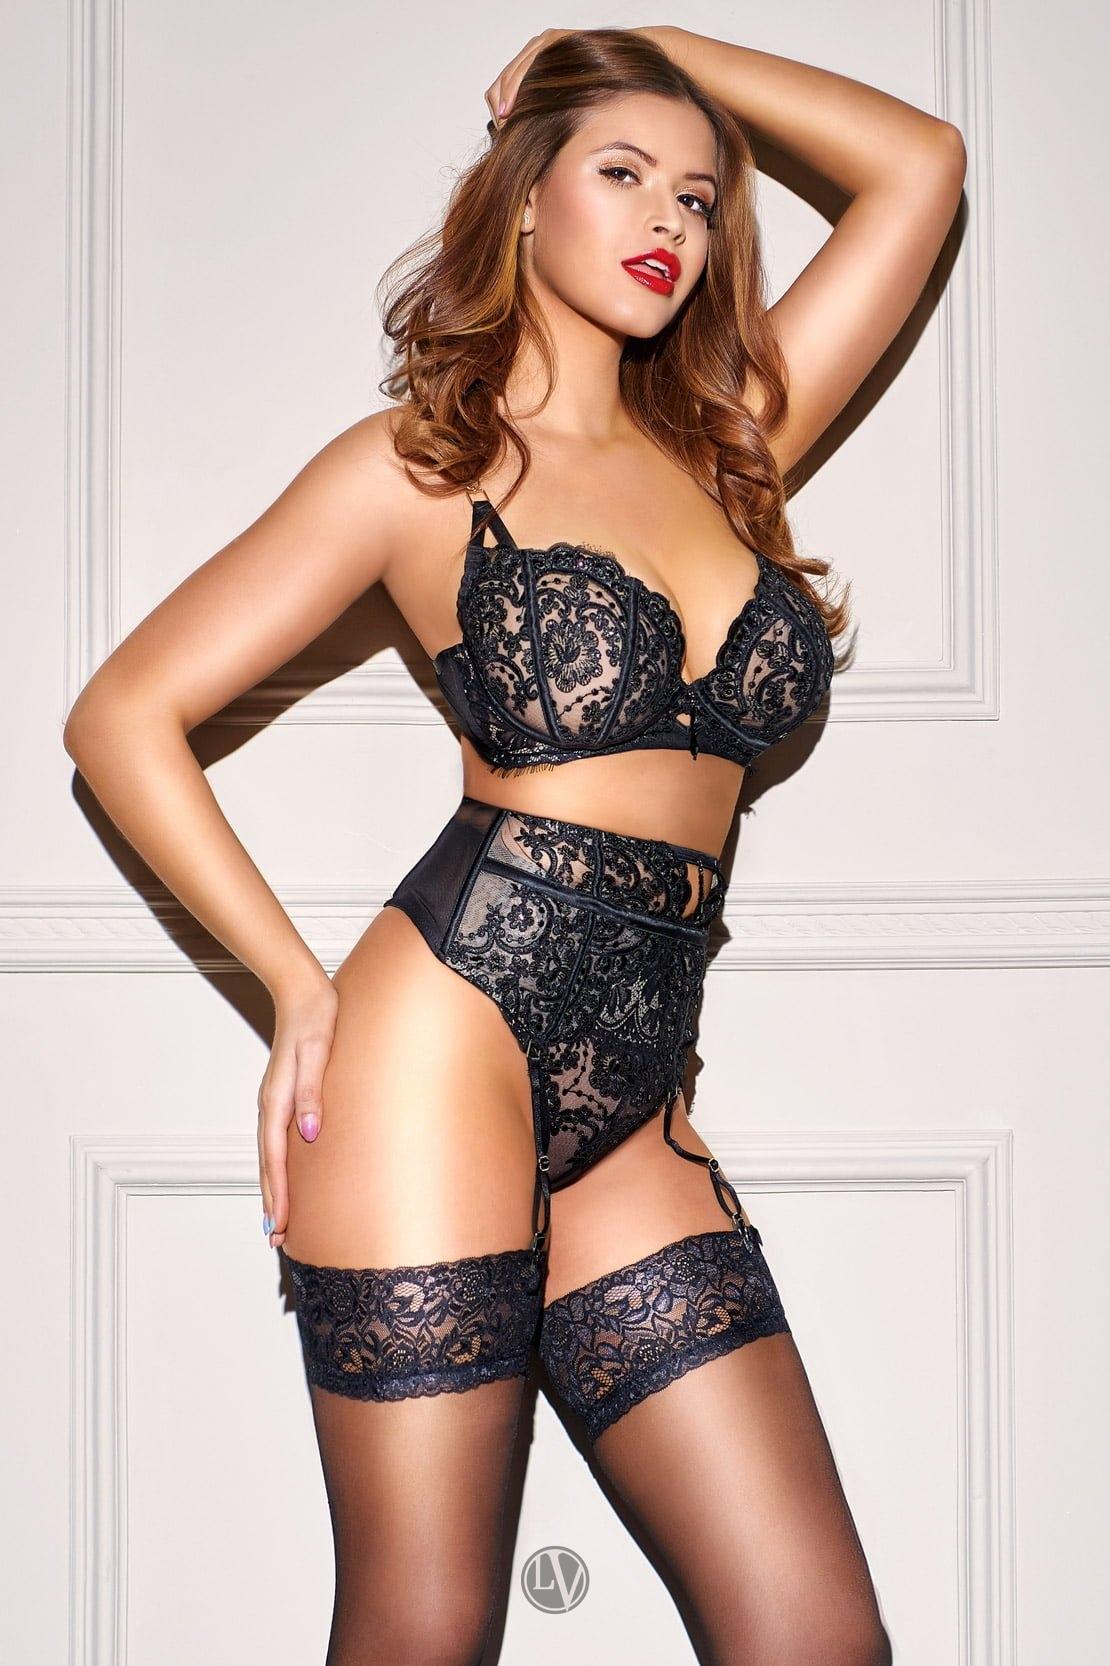 Sexy Brazilian escort Kim in her designer black lingerie and stockings.